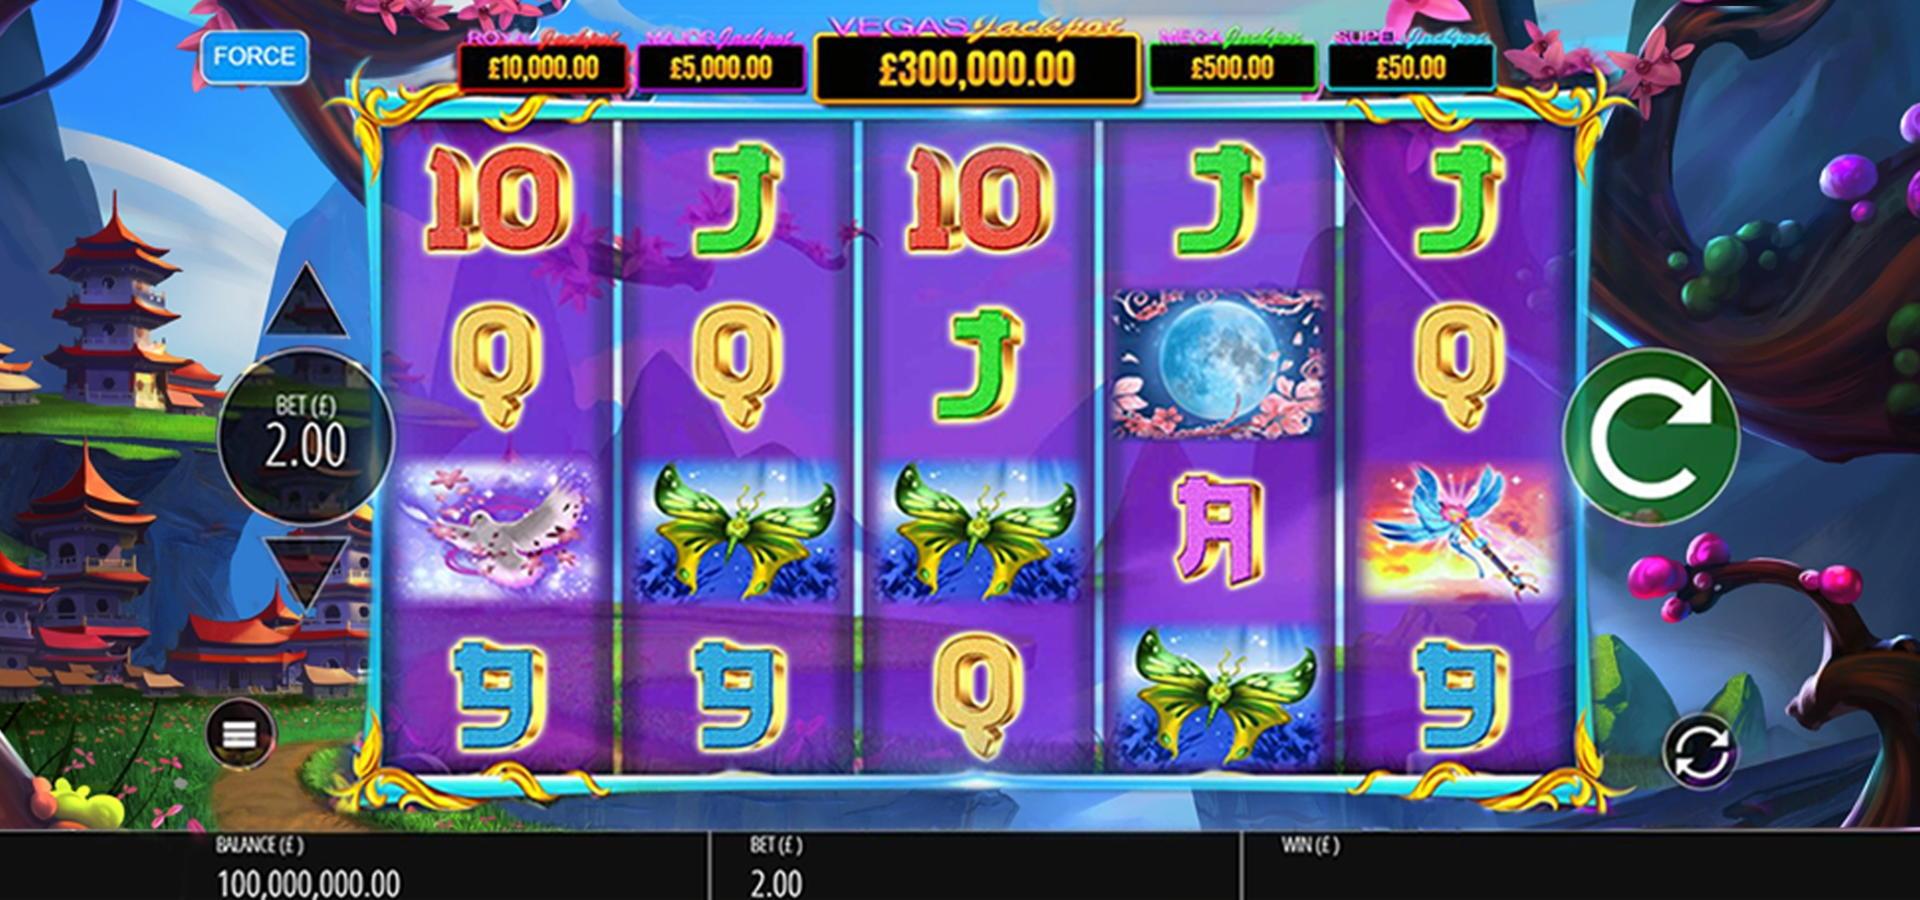 490% Signup Casino Bonus at bWin